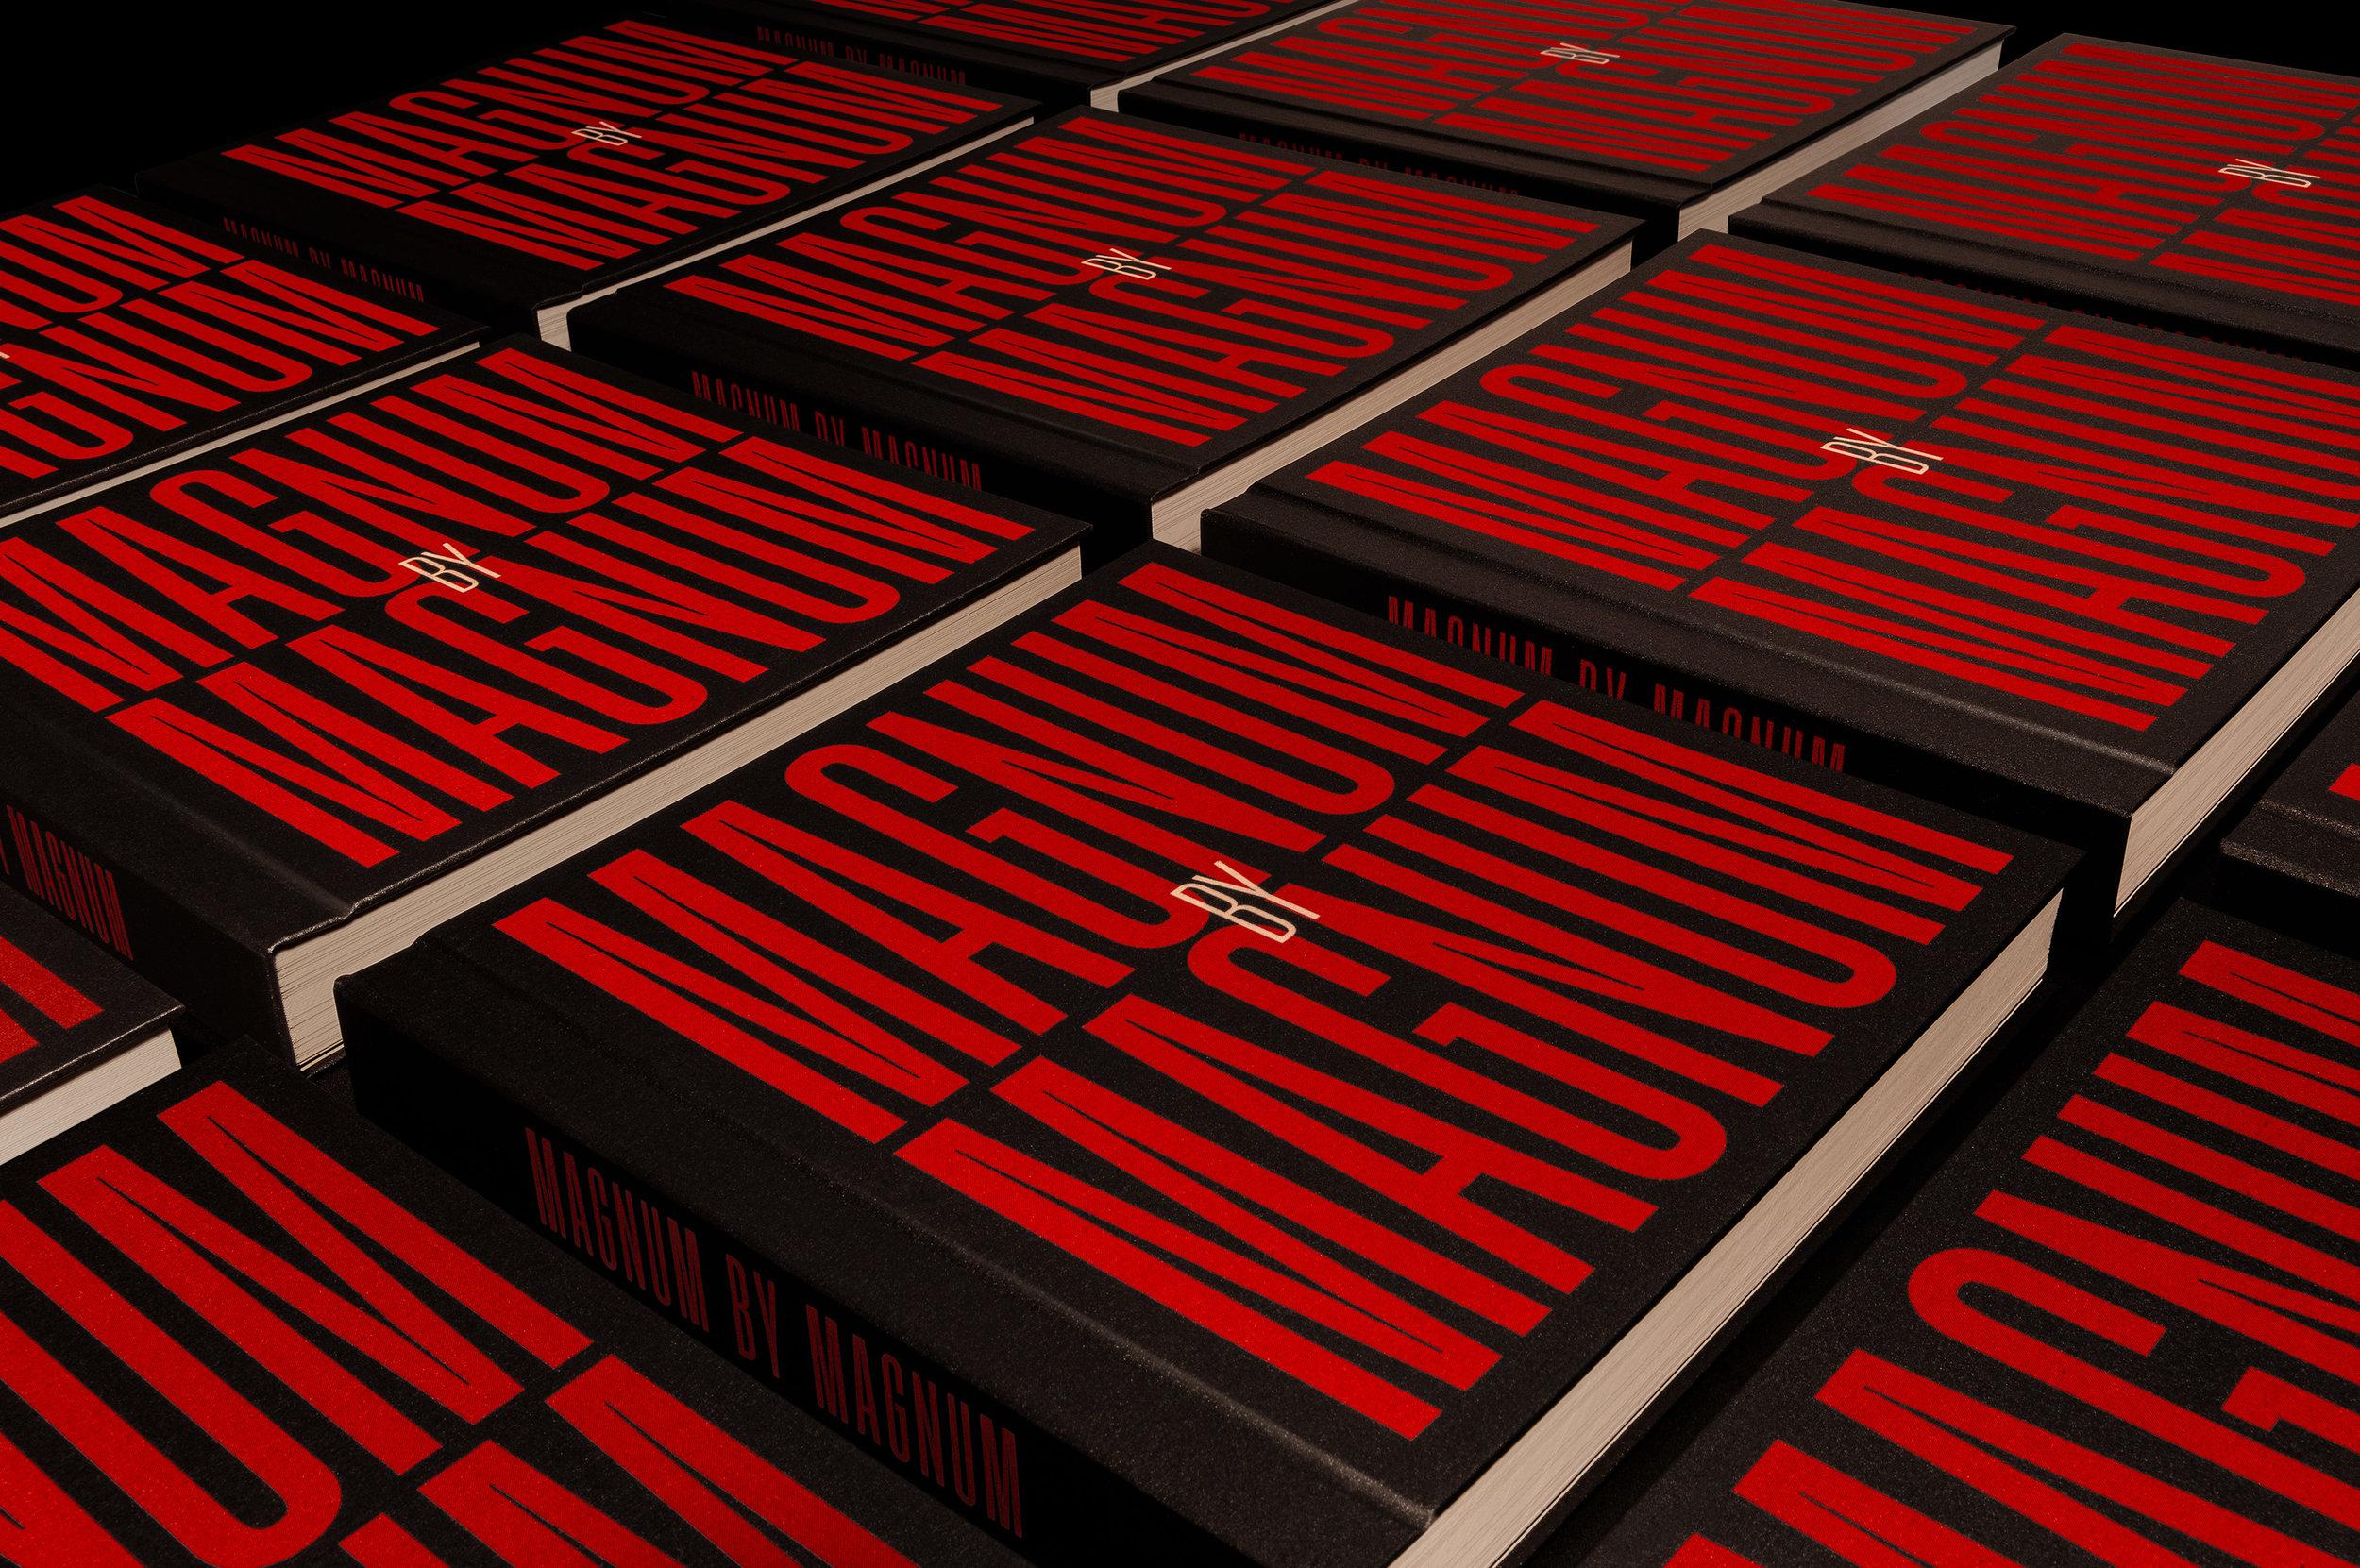 magnum-by-magnum-book4.jpg